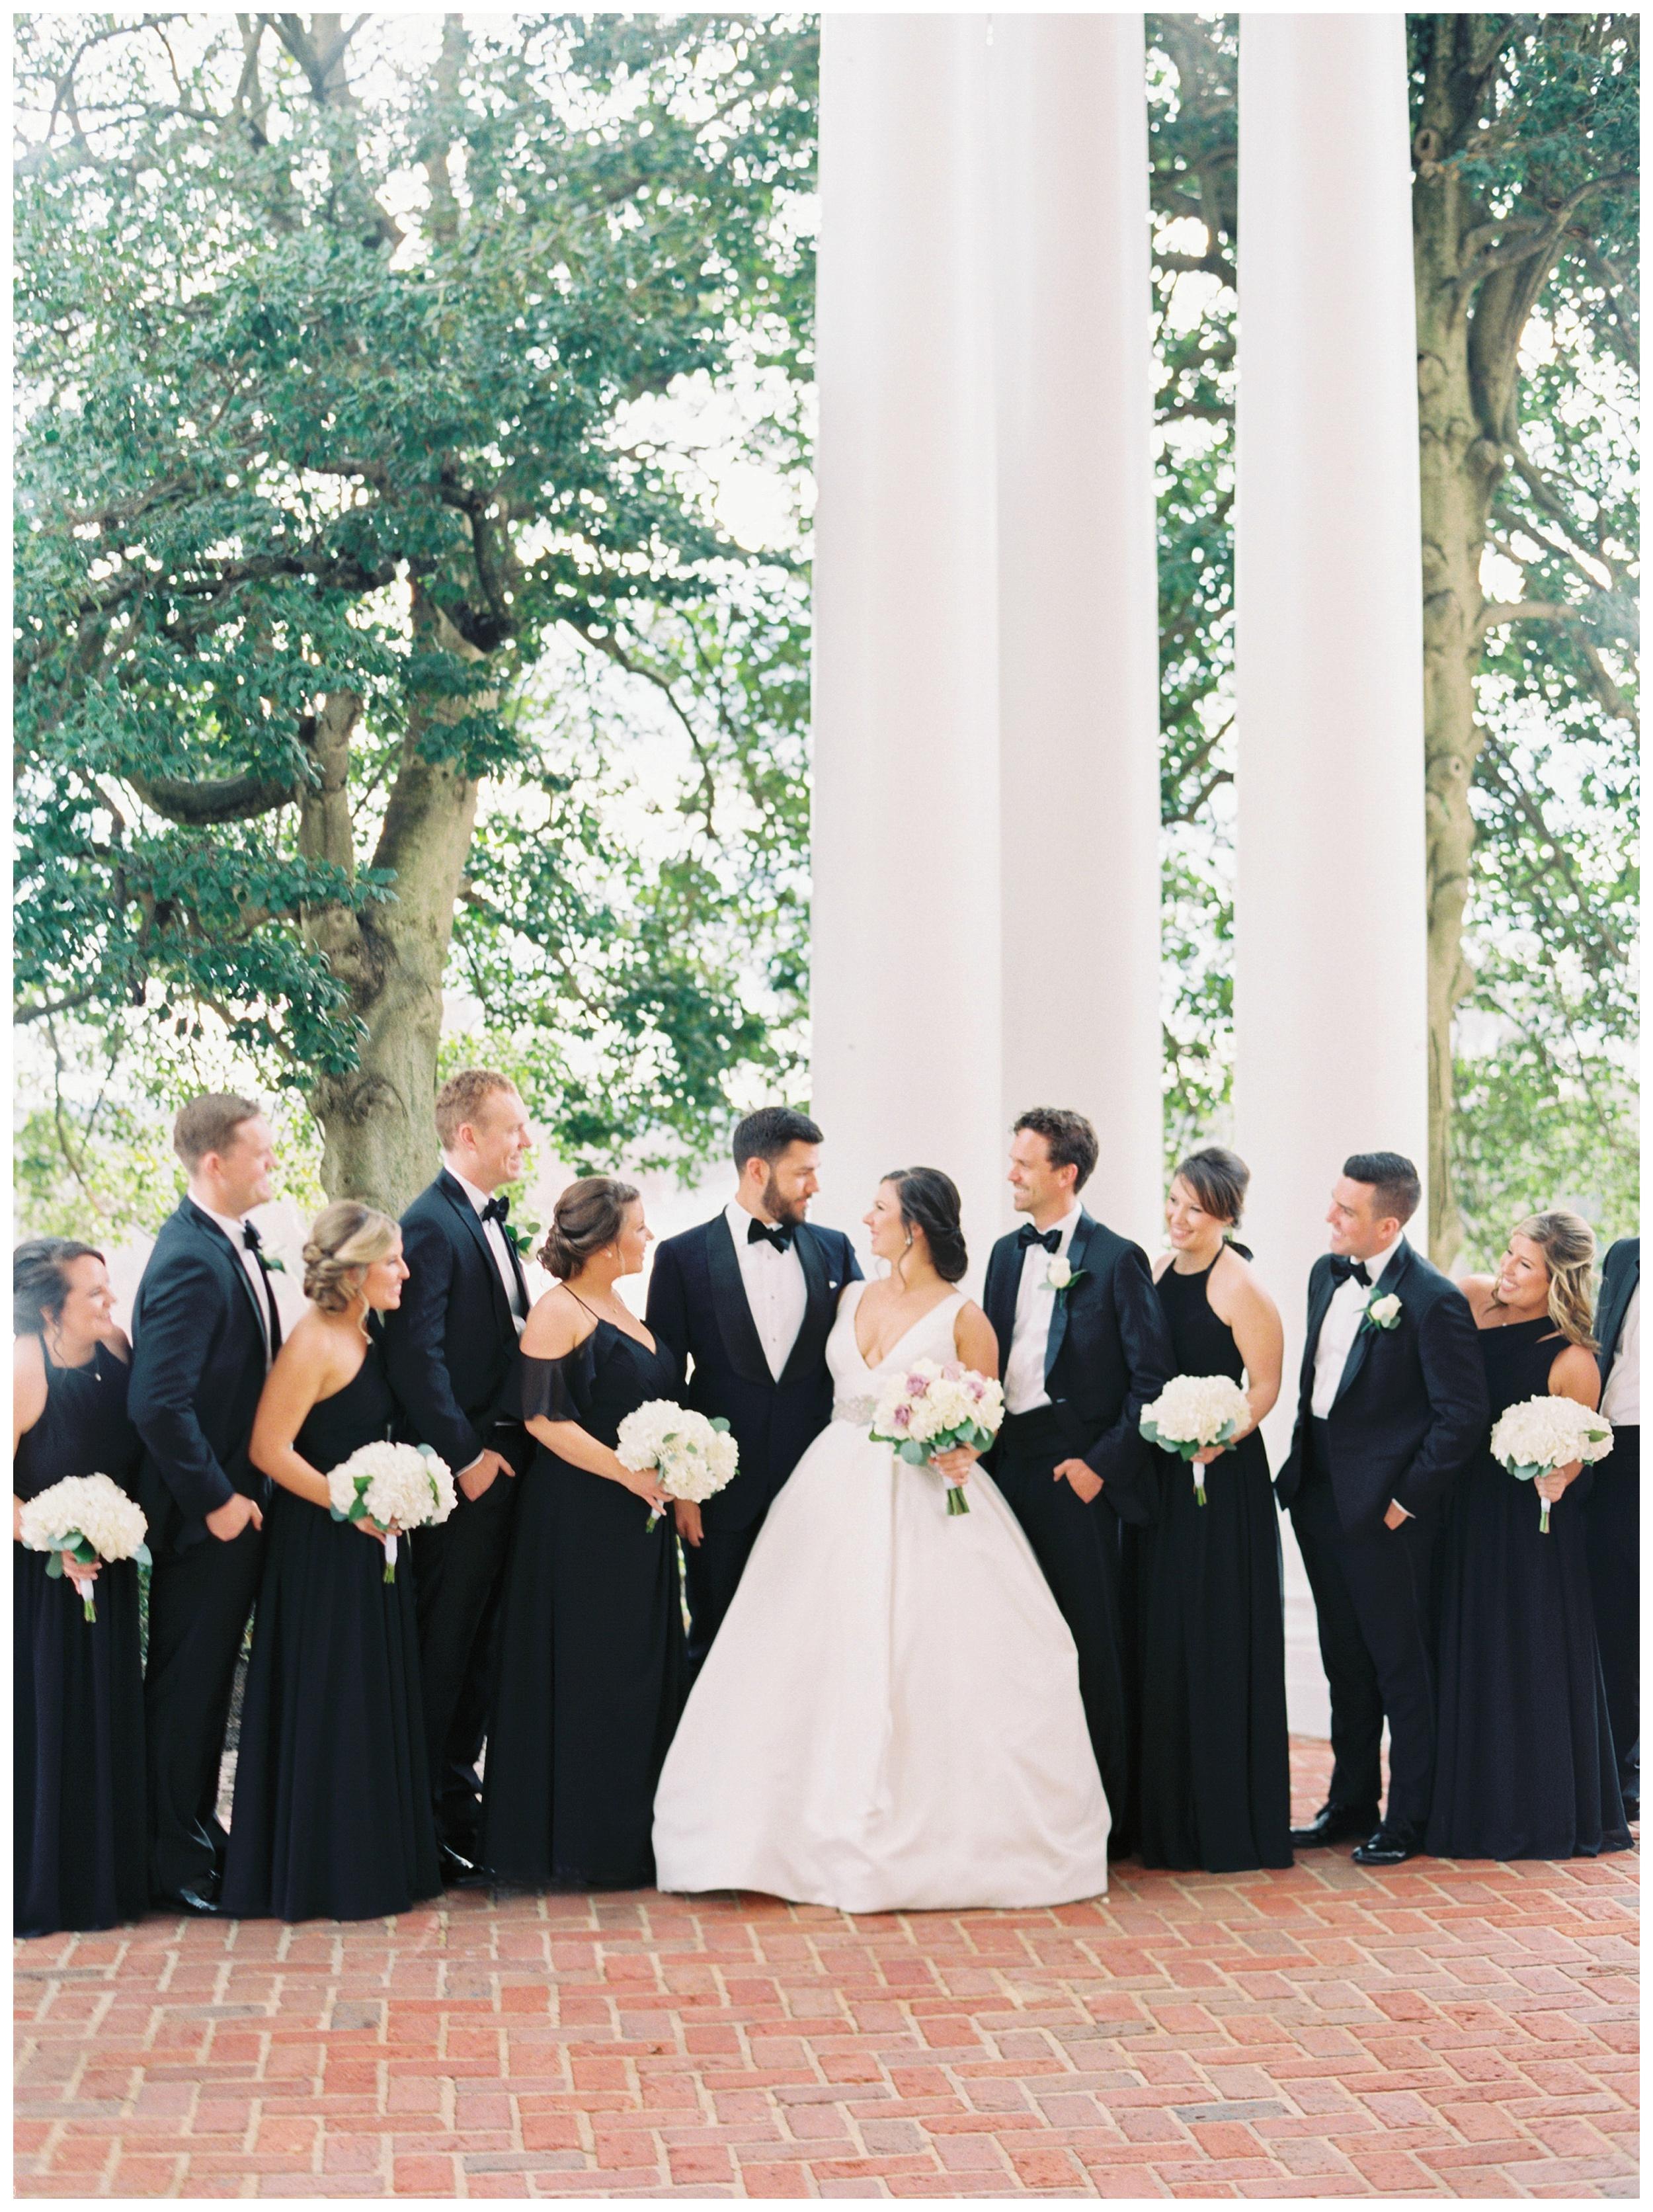 Country Club of Virginia Wedding | Richmond Wedding Photographer_0087.jpg